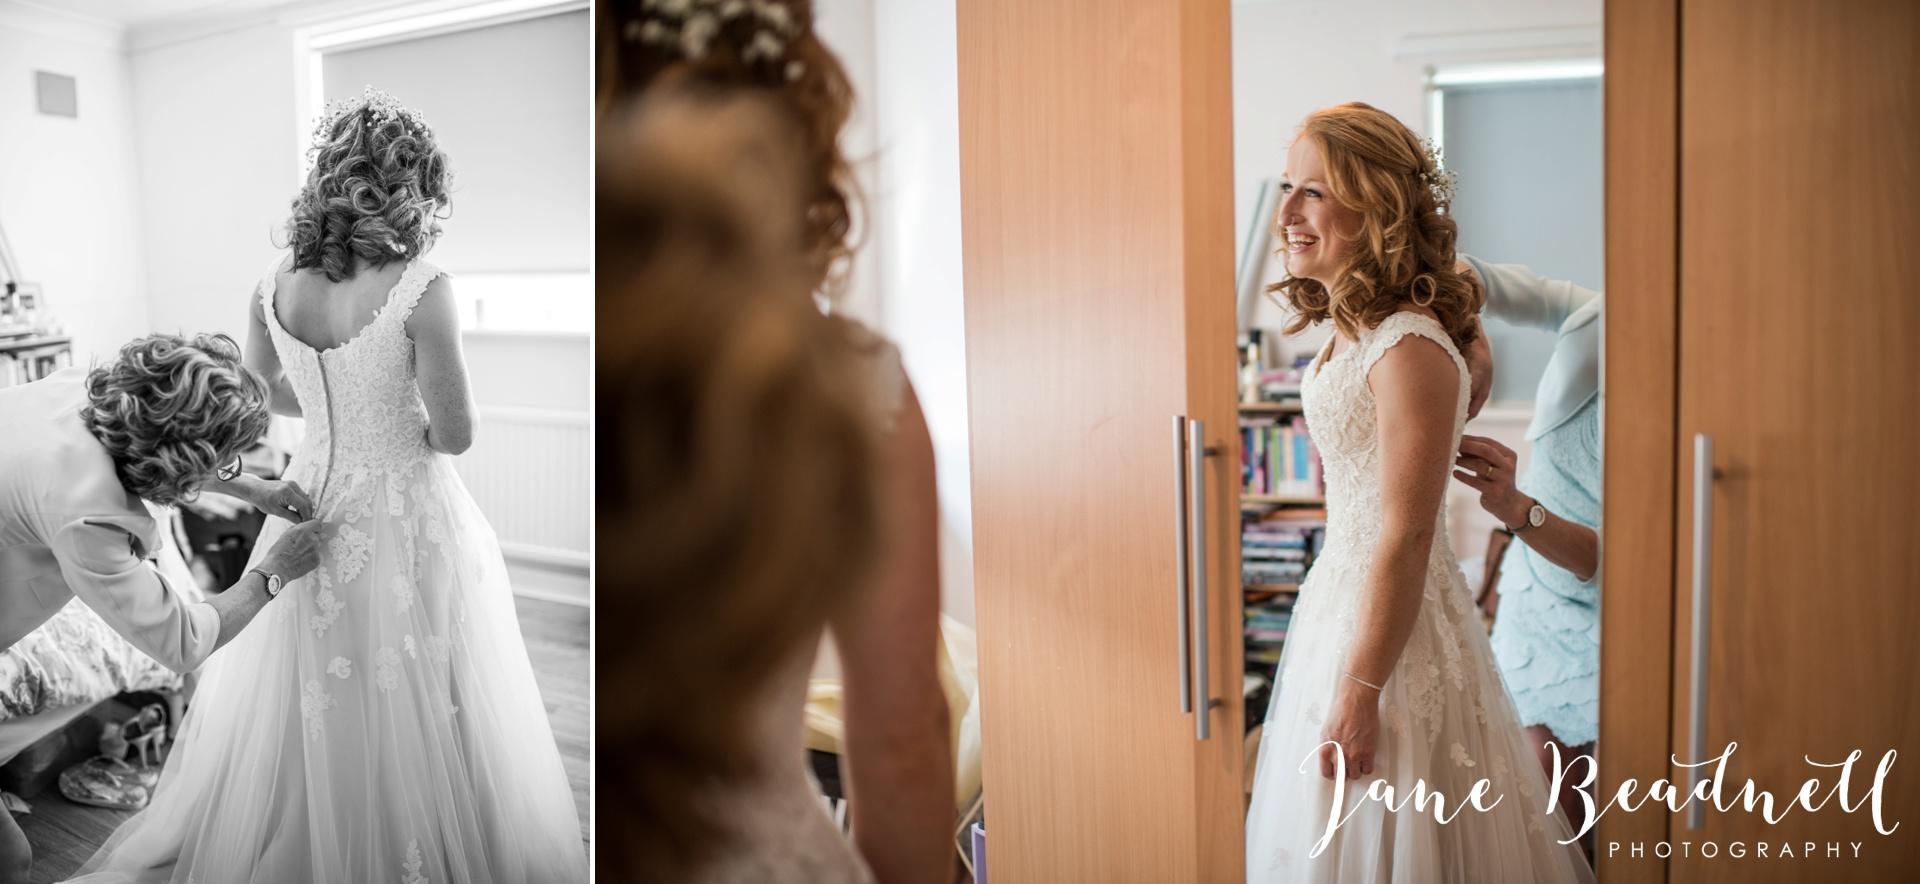 yorkshire-fine-art-wedding-photographer-jane-beadnell-photography-poppleton-york_0007